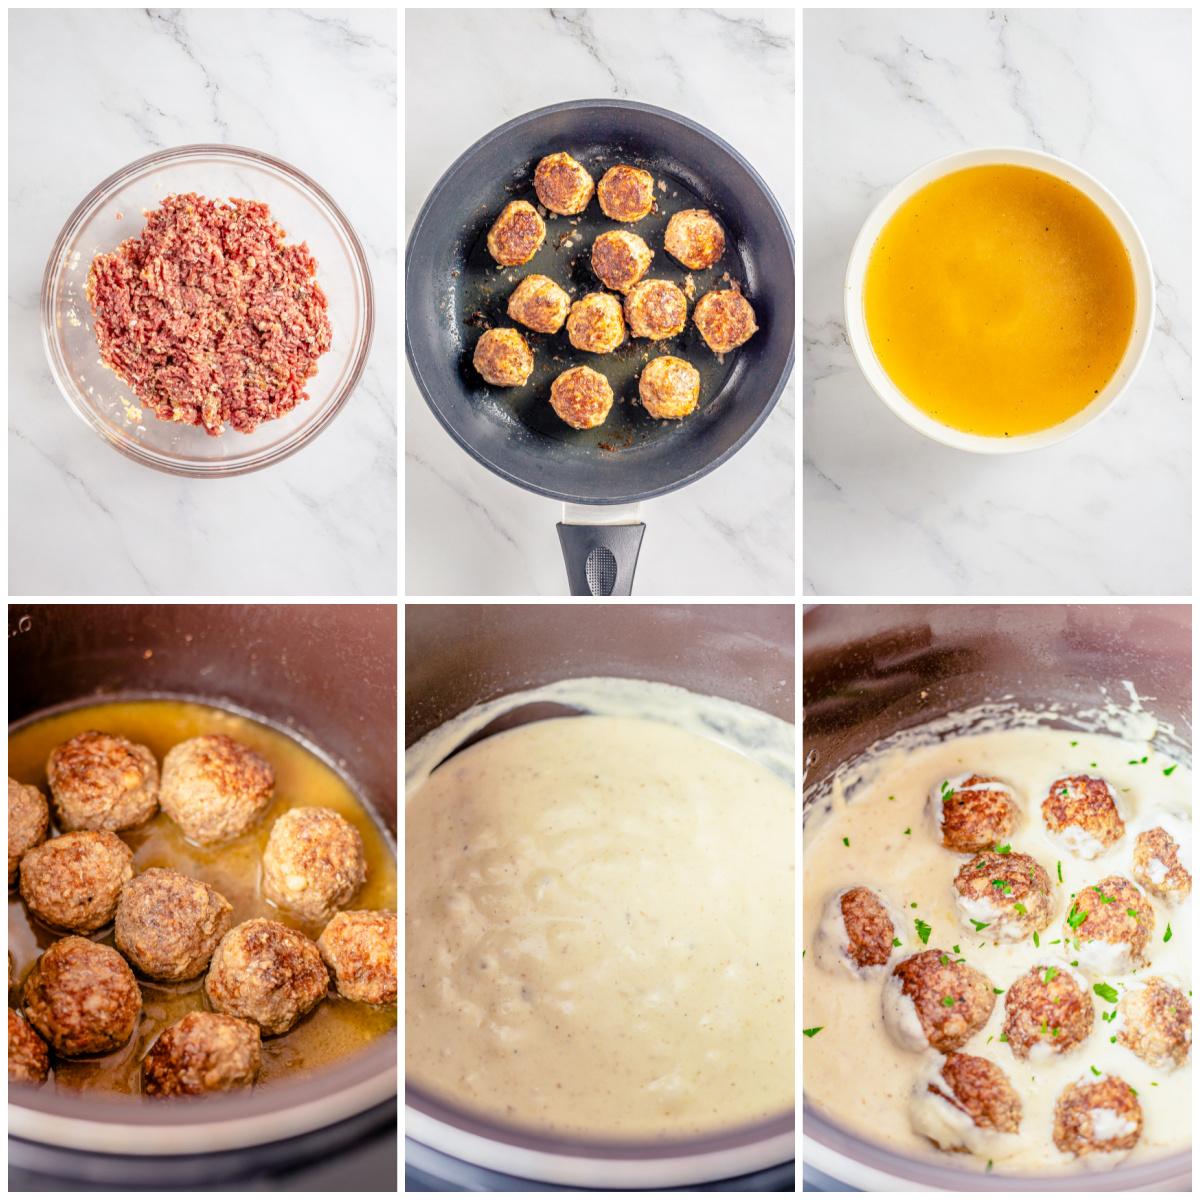 Step by step photos on how to make Crockpot Swedish Meatballs.